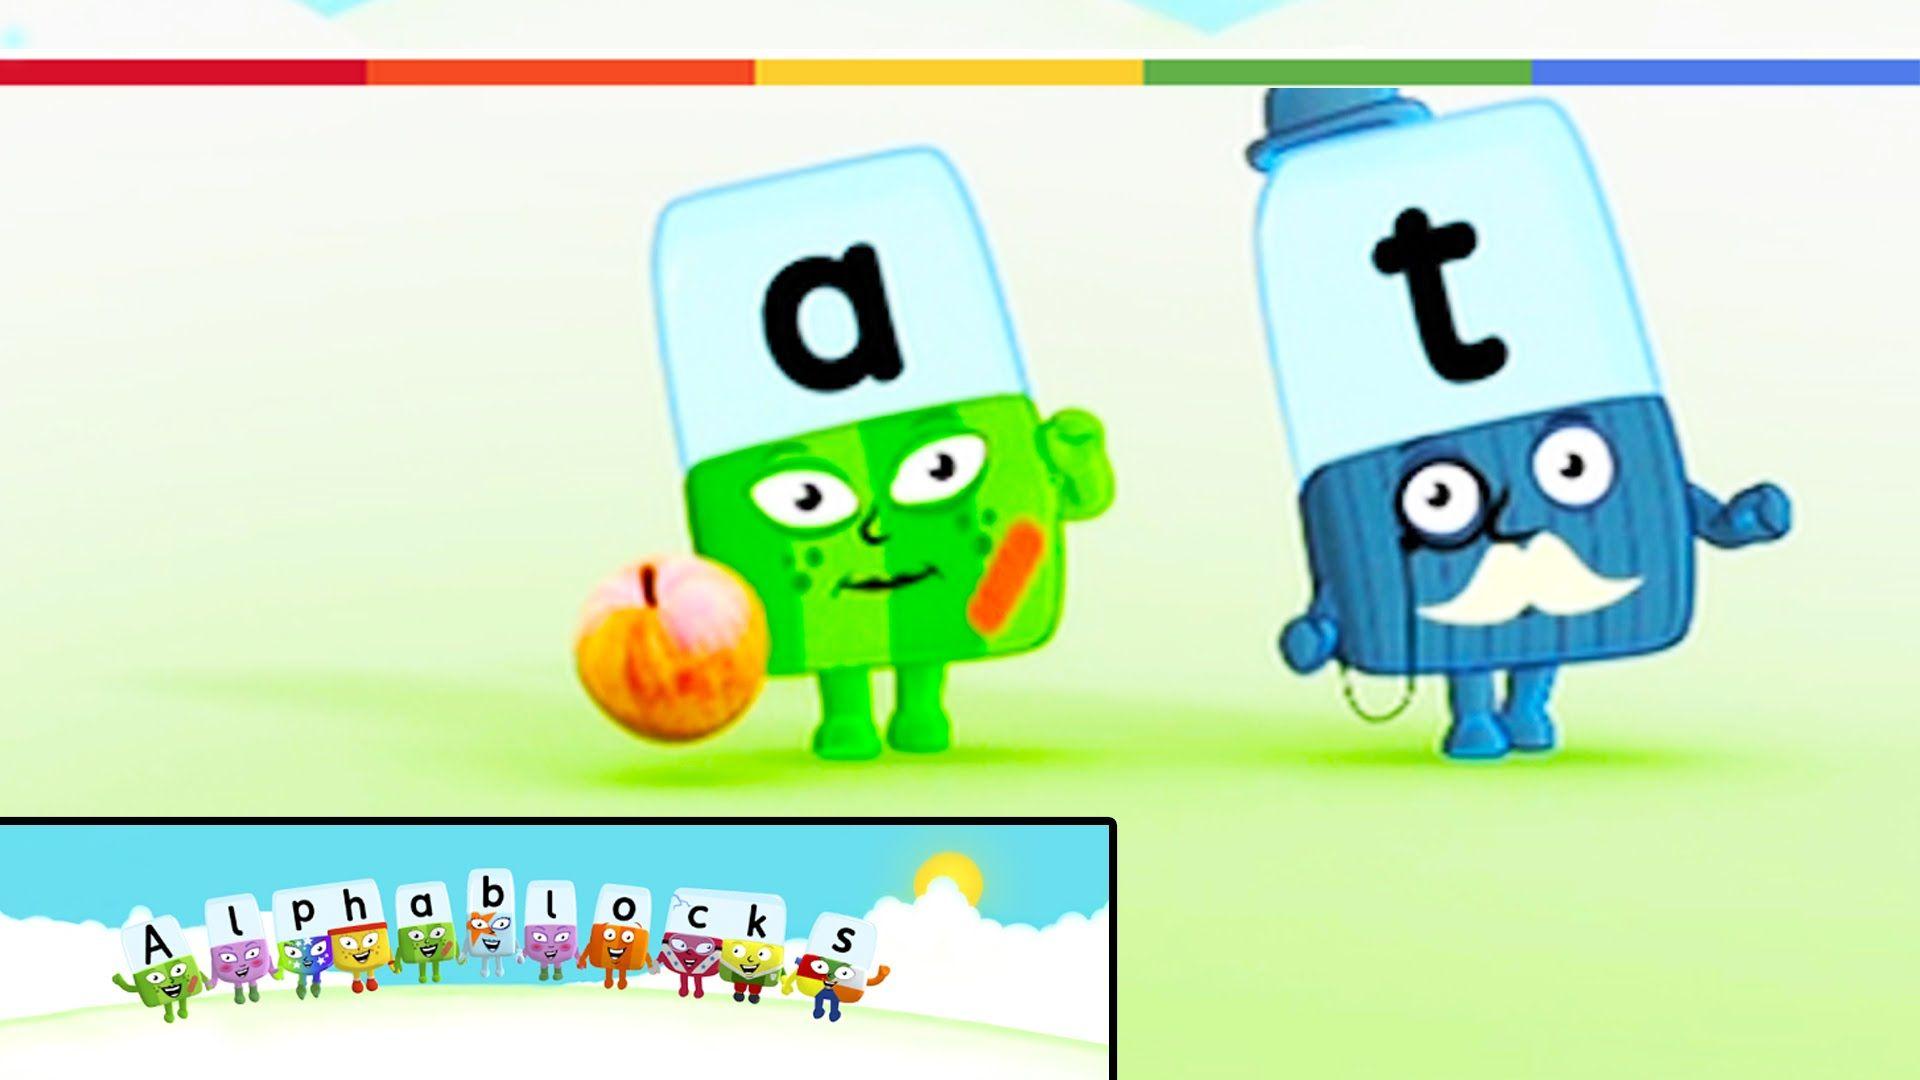 Alphablocks The Alphabet Learn The Sounds Of The Alphabet With Alphablocks